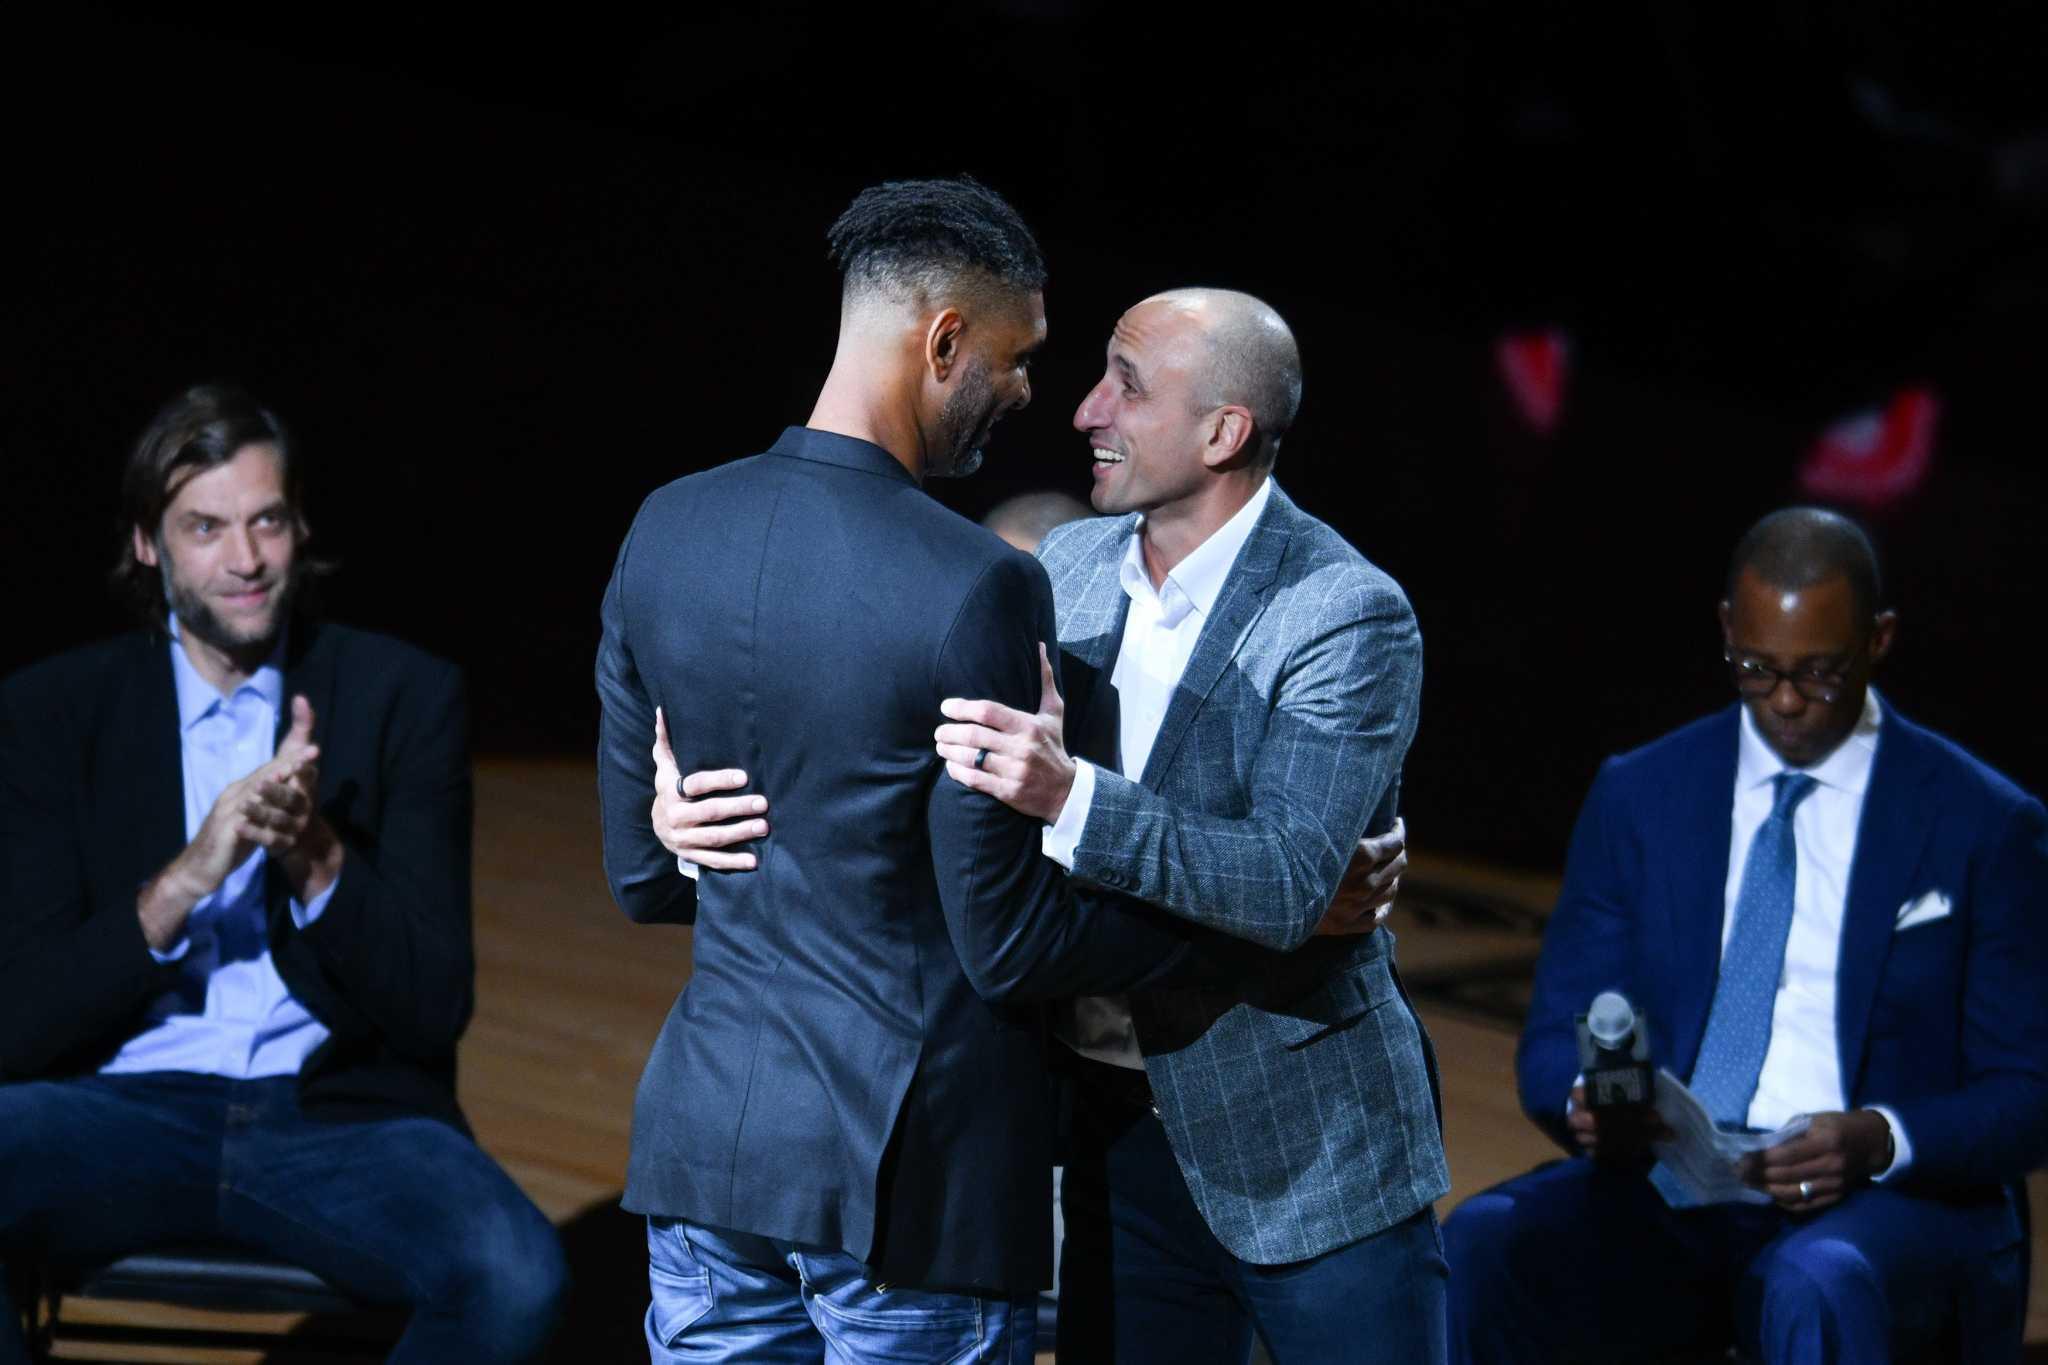 Manu Ginobili and son 'Simba G' reenact Lion King moment during Spurs game